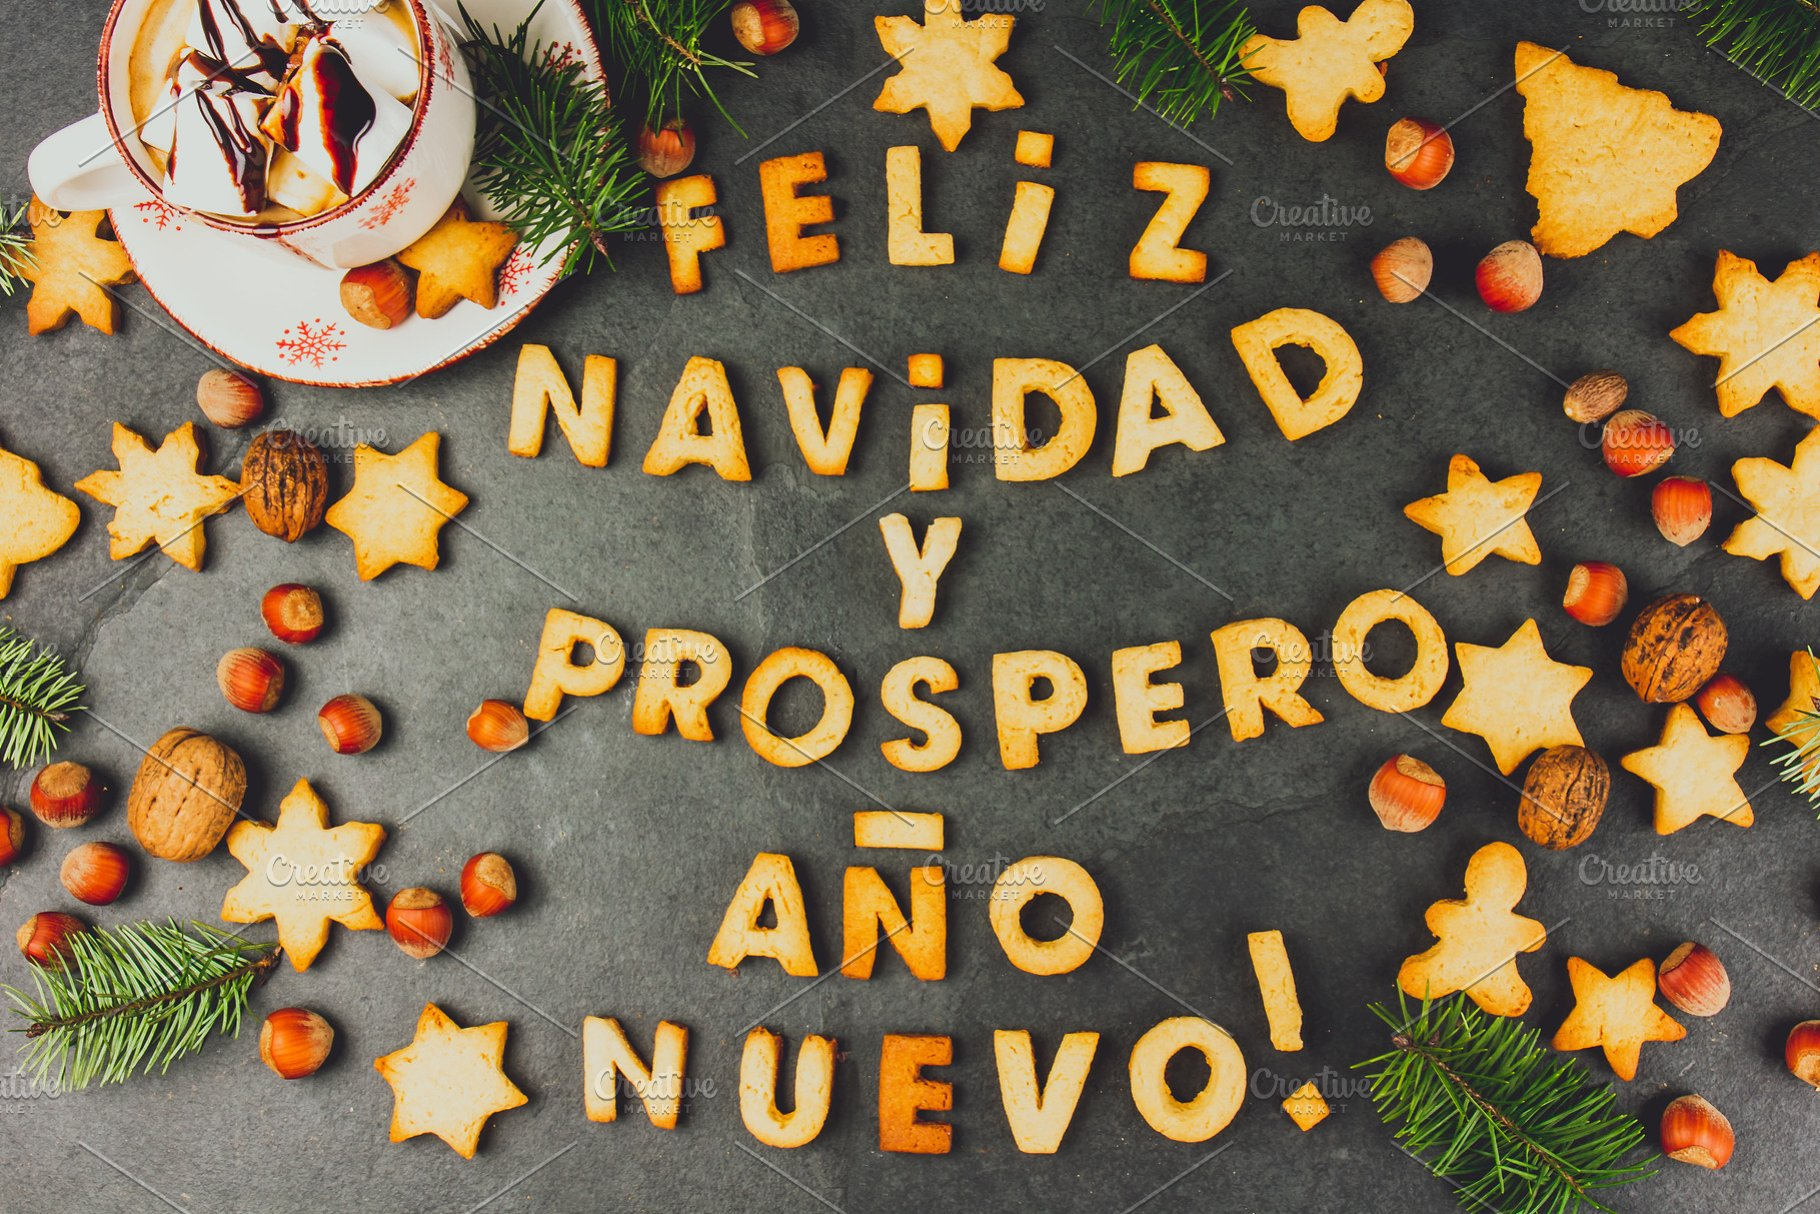 Merry Christmas In Spanish.Feliz Navidad En Spanish Cookies Words Merry Christmas And Happy New Year En Spanish With Baked Cookies Christmas Card For Hispanic Countries Top